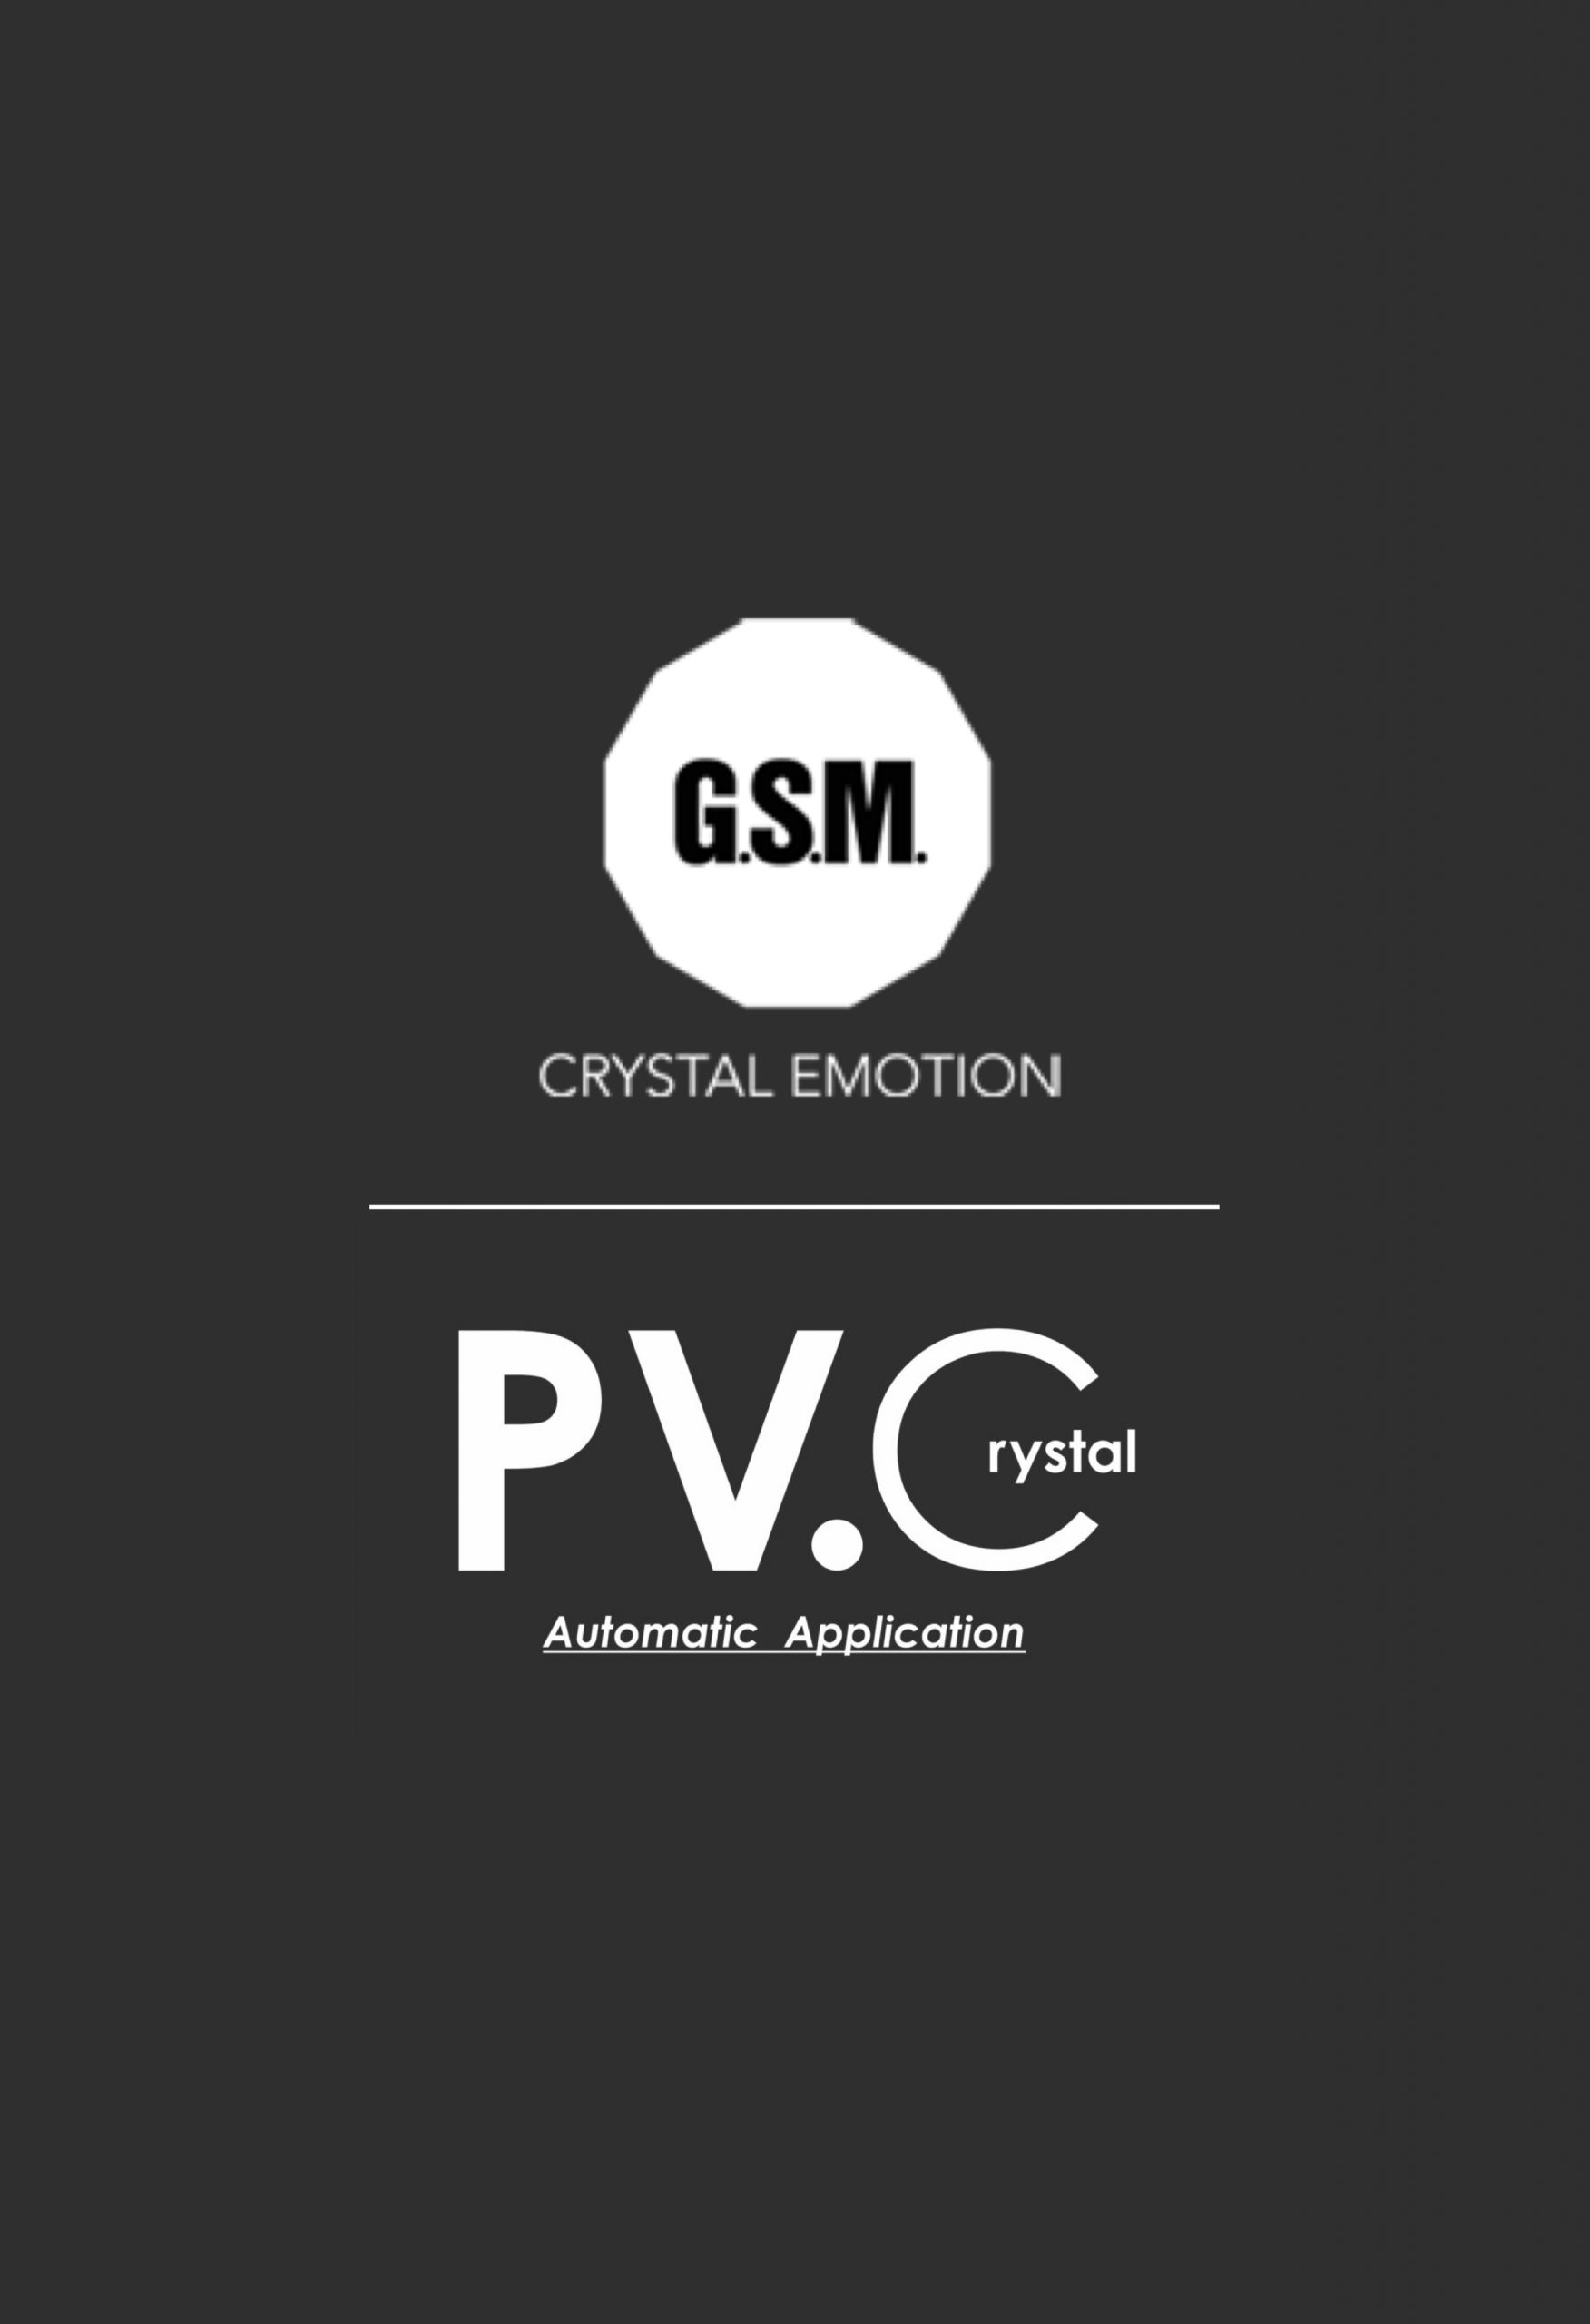 PC.Crystal - Applicazione automatica su PVC trasparente